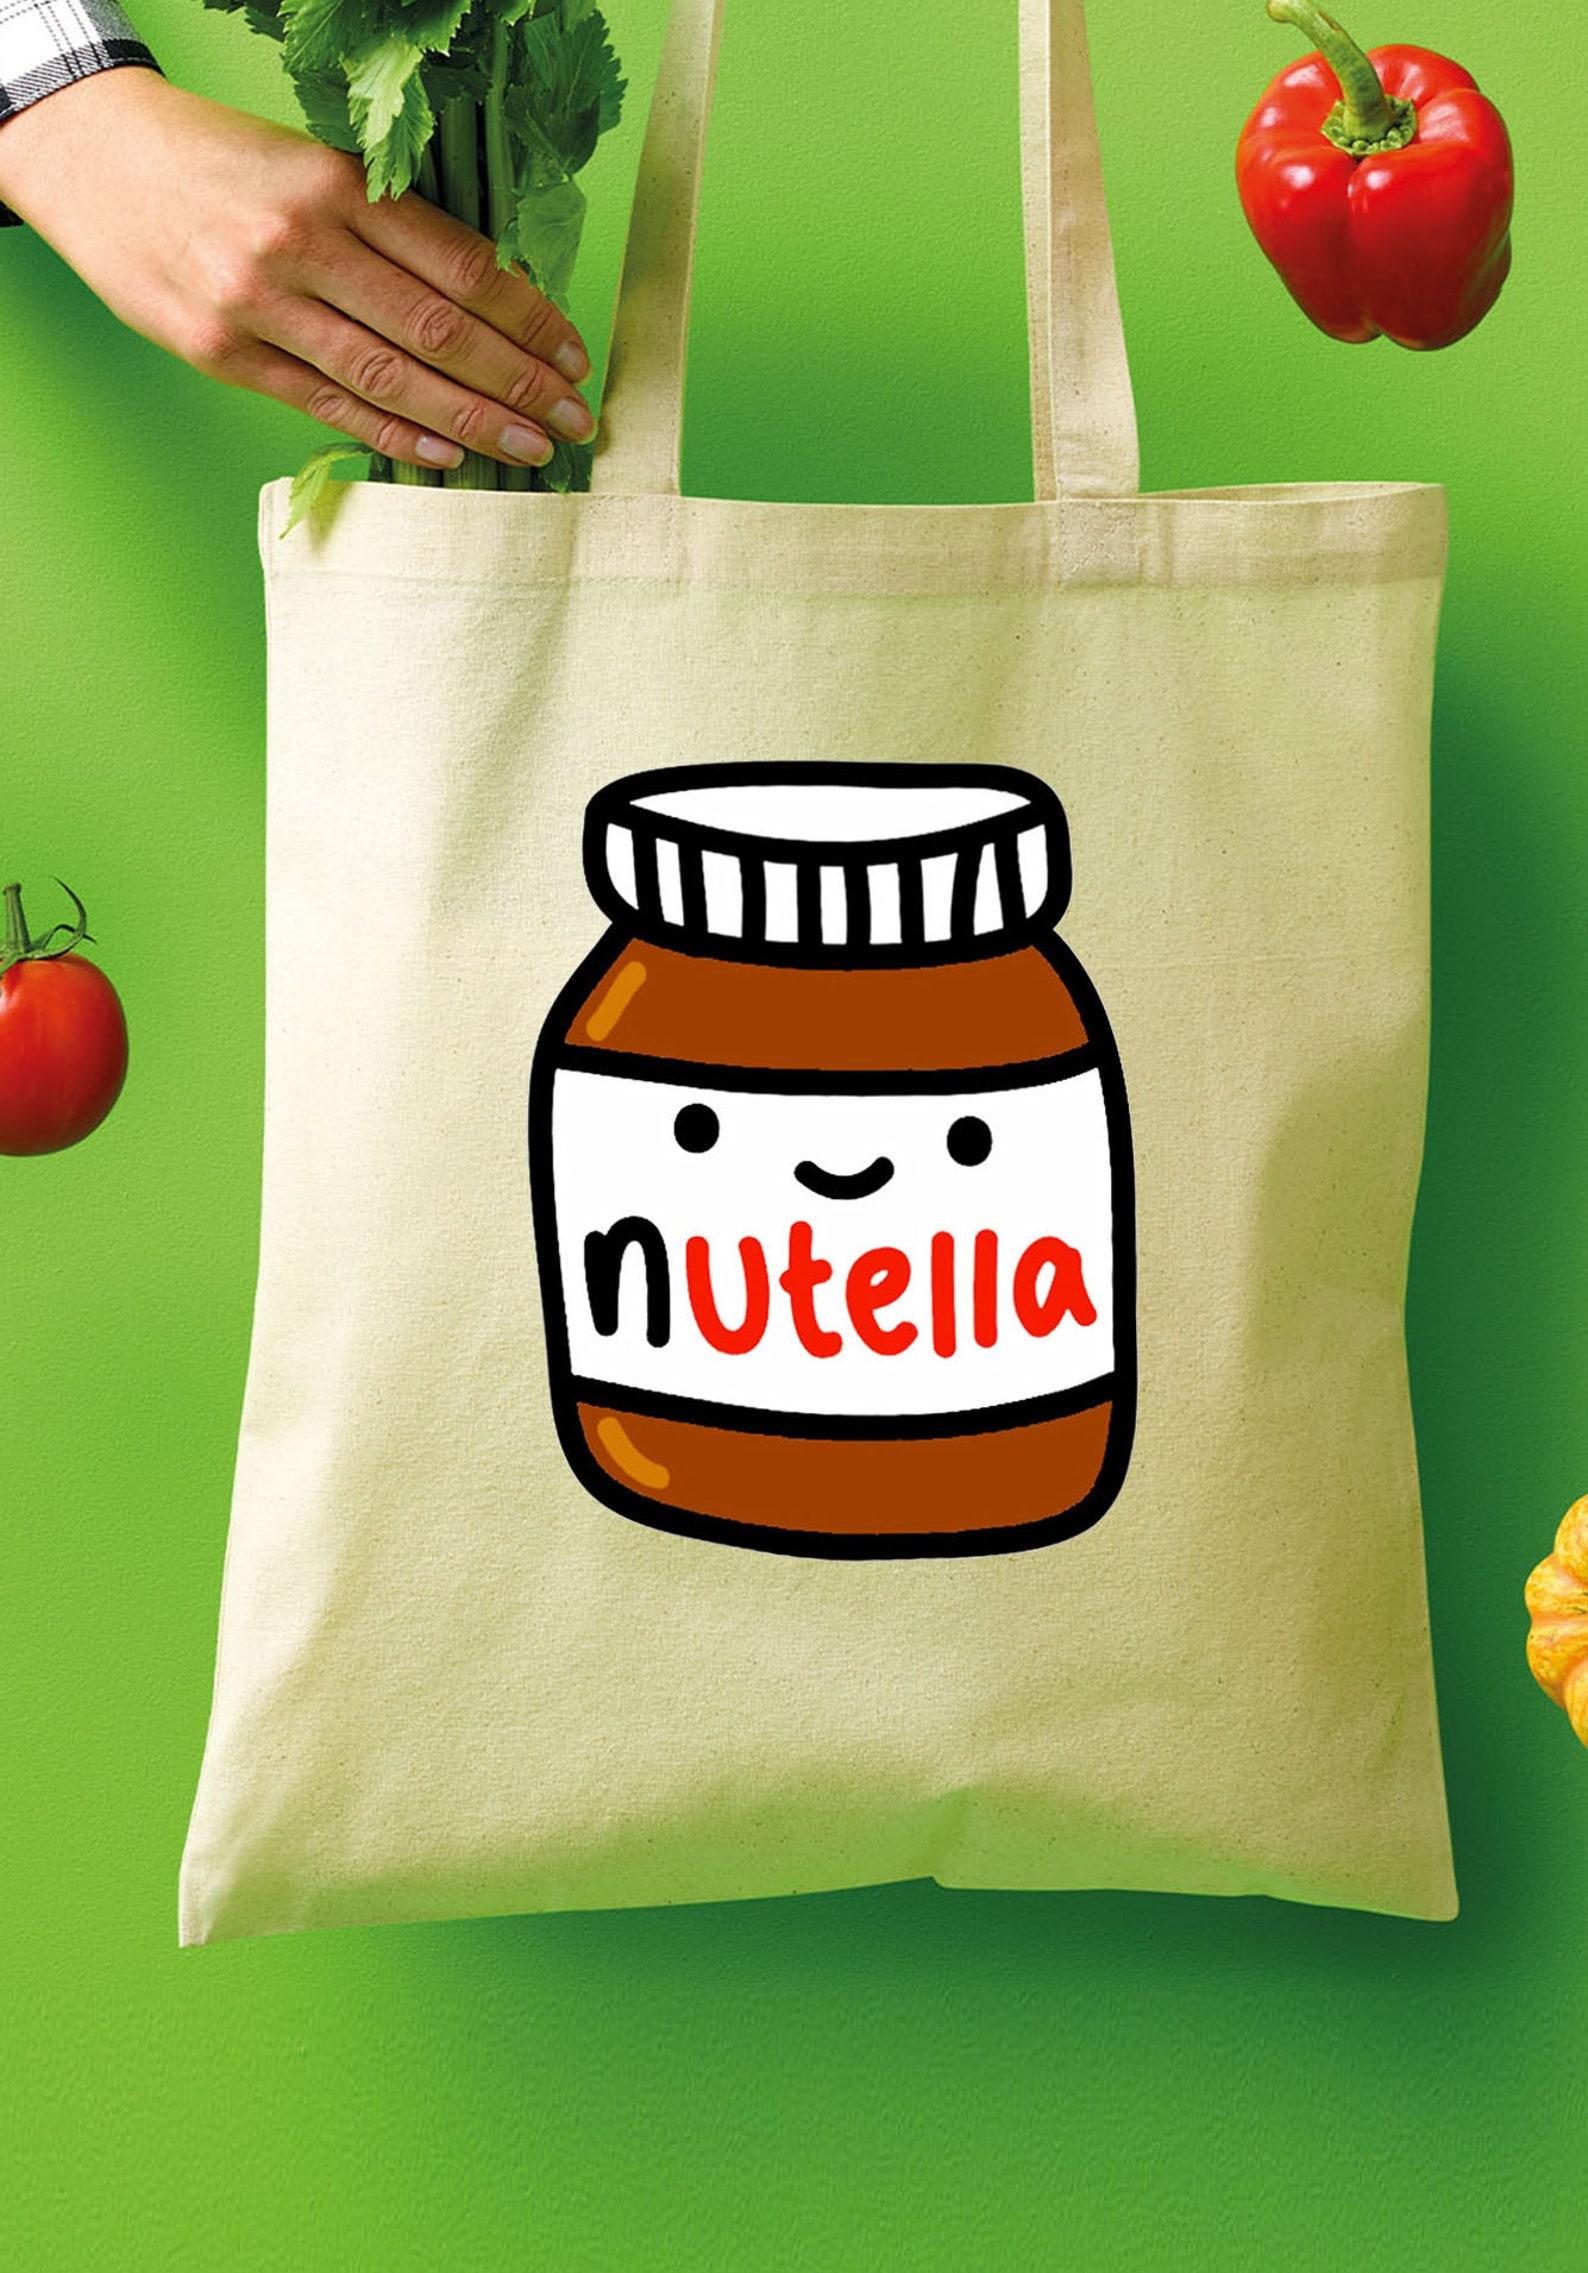 Nutella Chocolate Hazelnut Spread Tote Shopper Bags